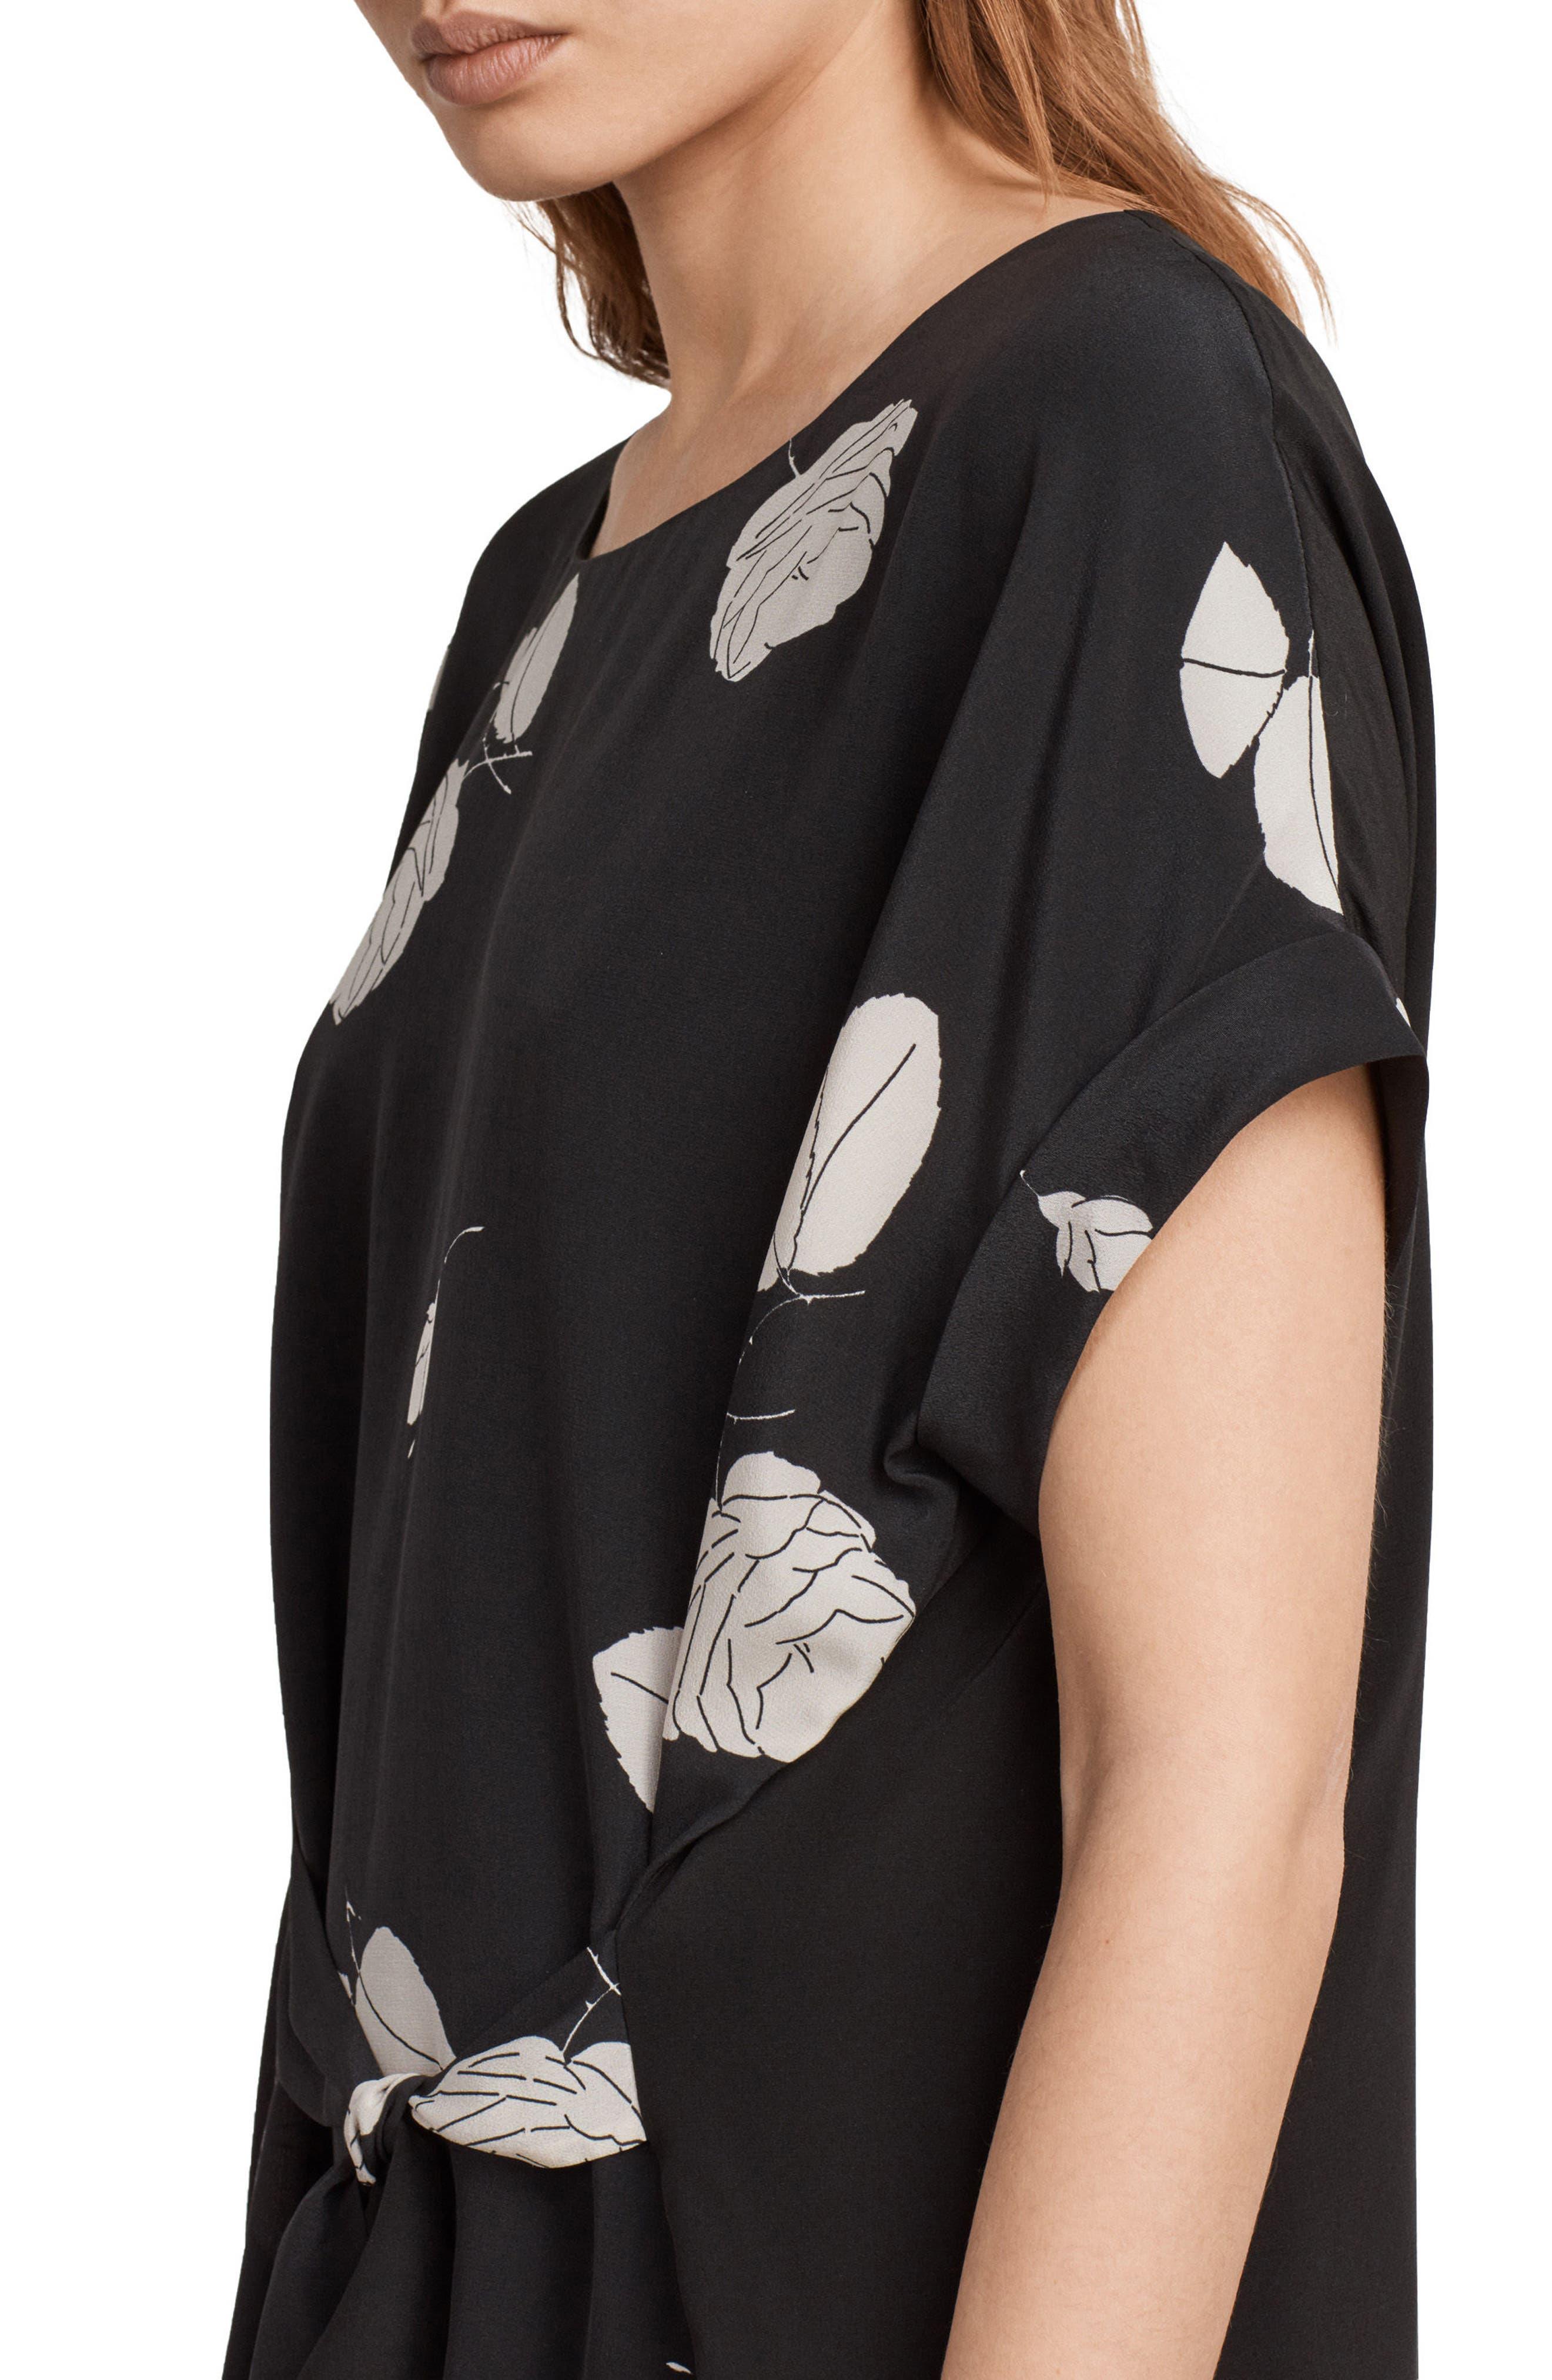 Sonny Rodin Silk Dress,                             Alternate thumbnail 4, color,                             Black